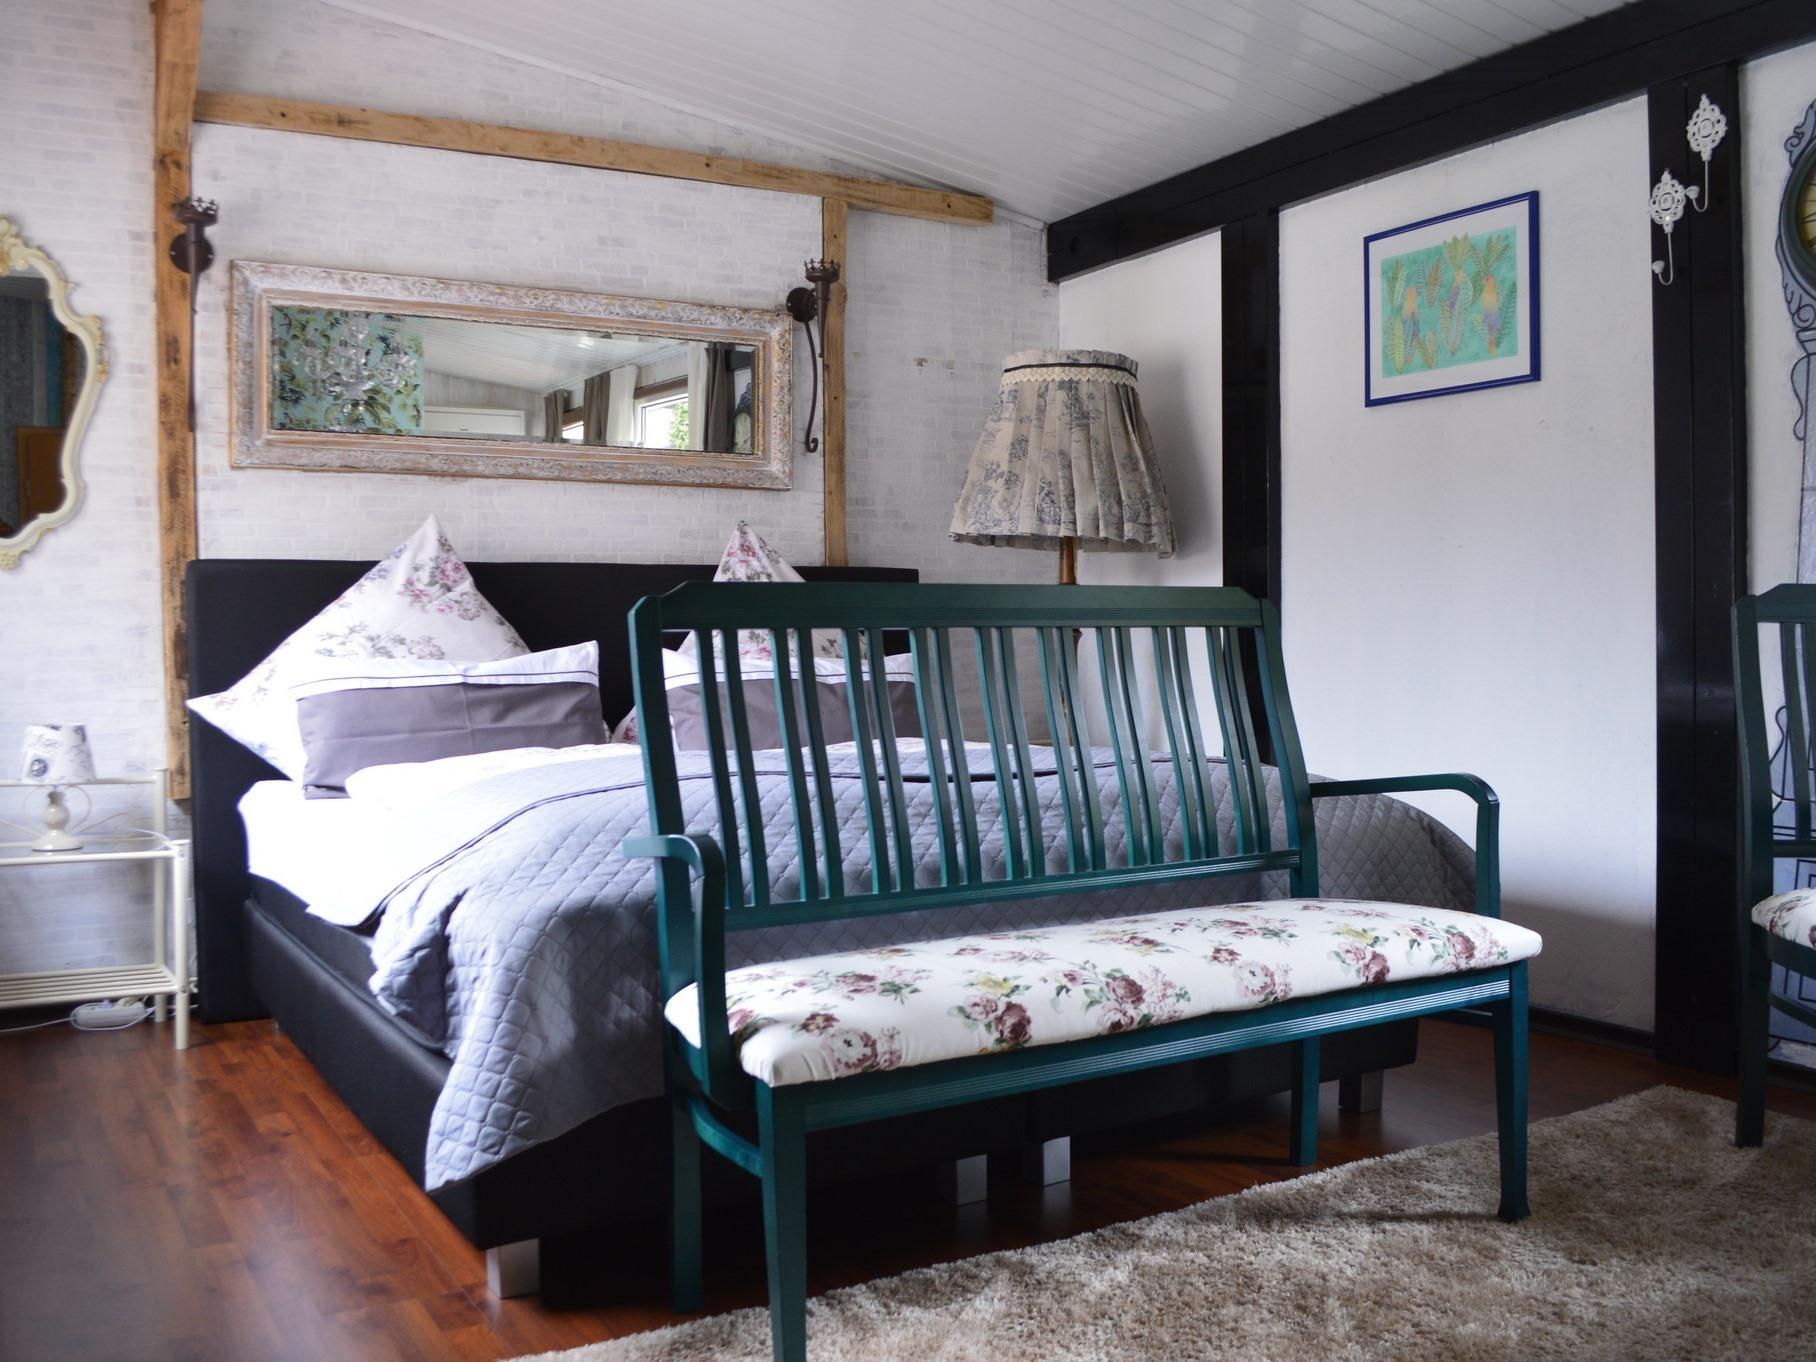 Doppelzimmer-Ensuite Dusche - Standardpreis